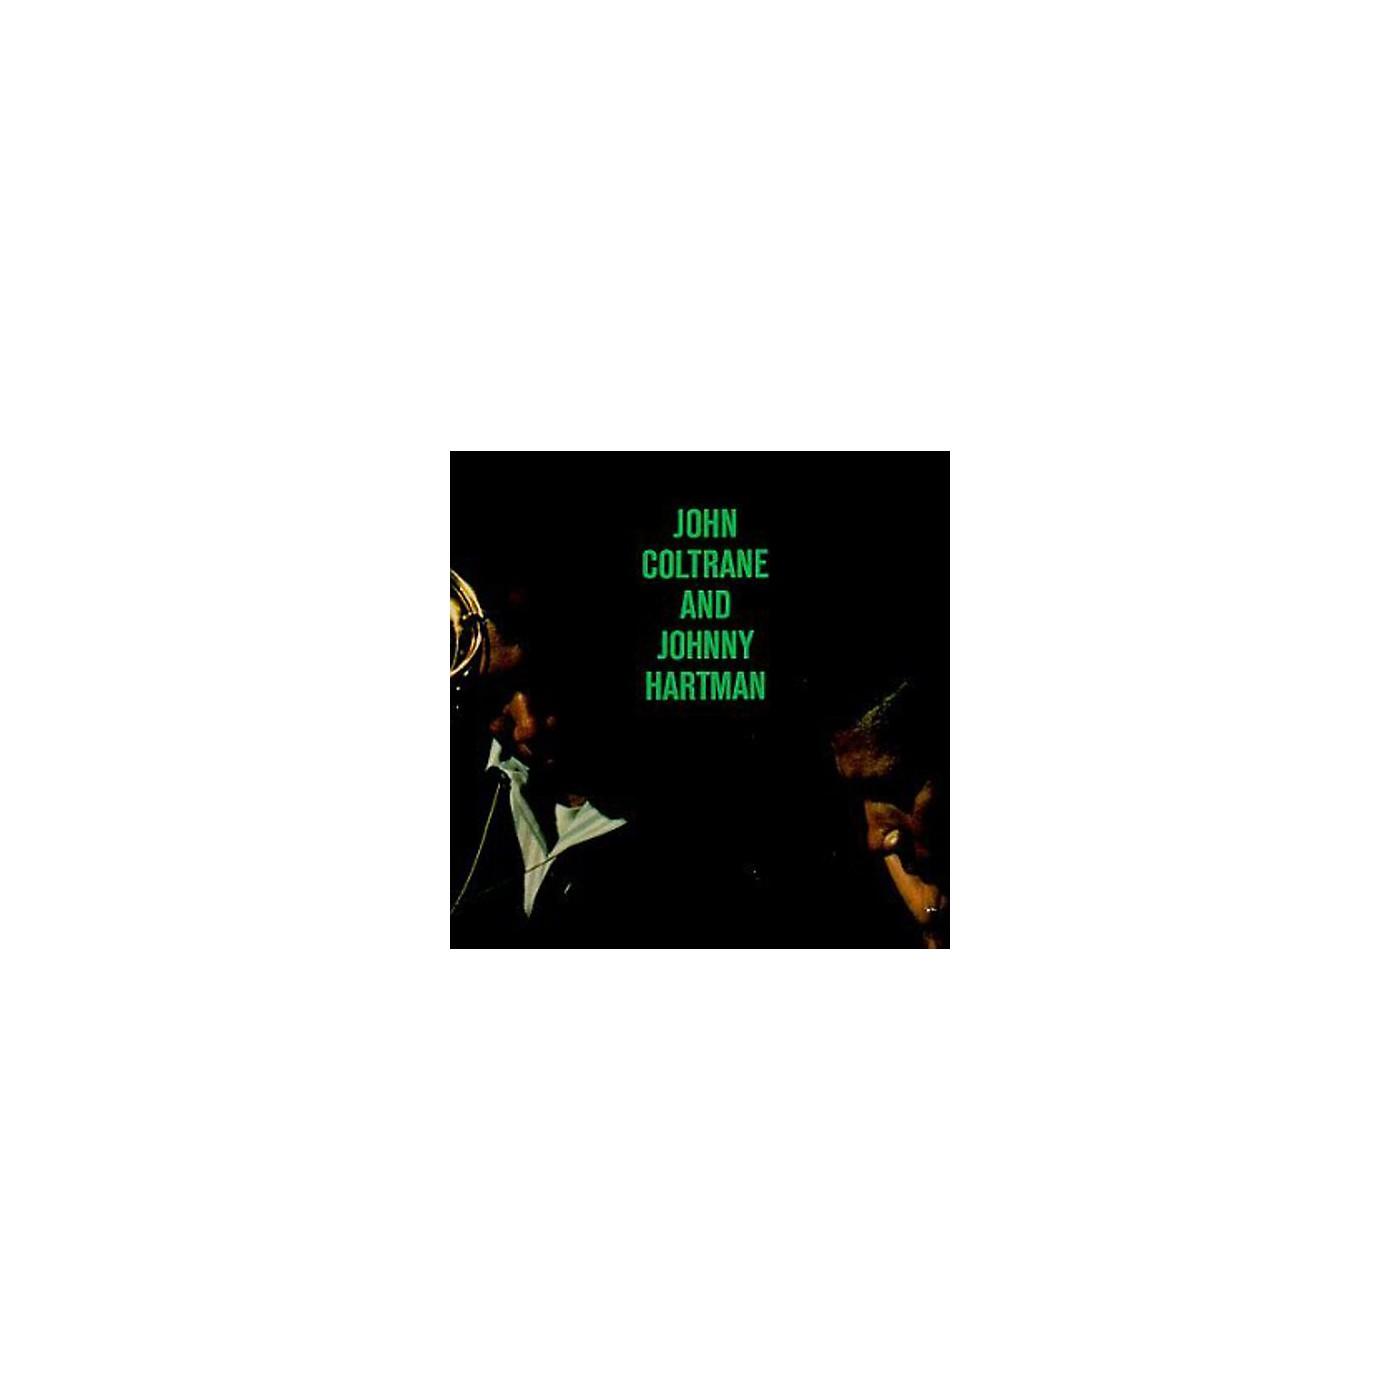 Alliance John Coltrane - John Coltrane & Johnny Hartman (remastered) thumbnail